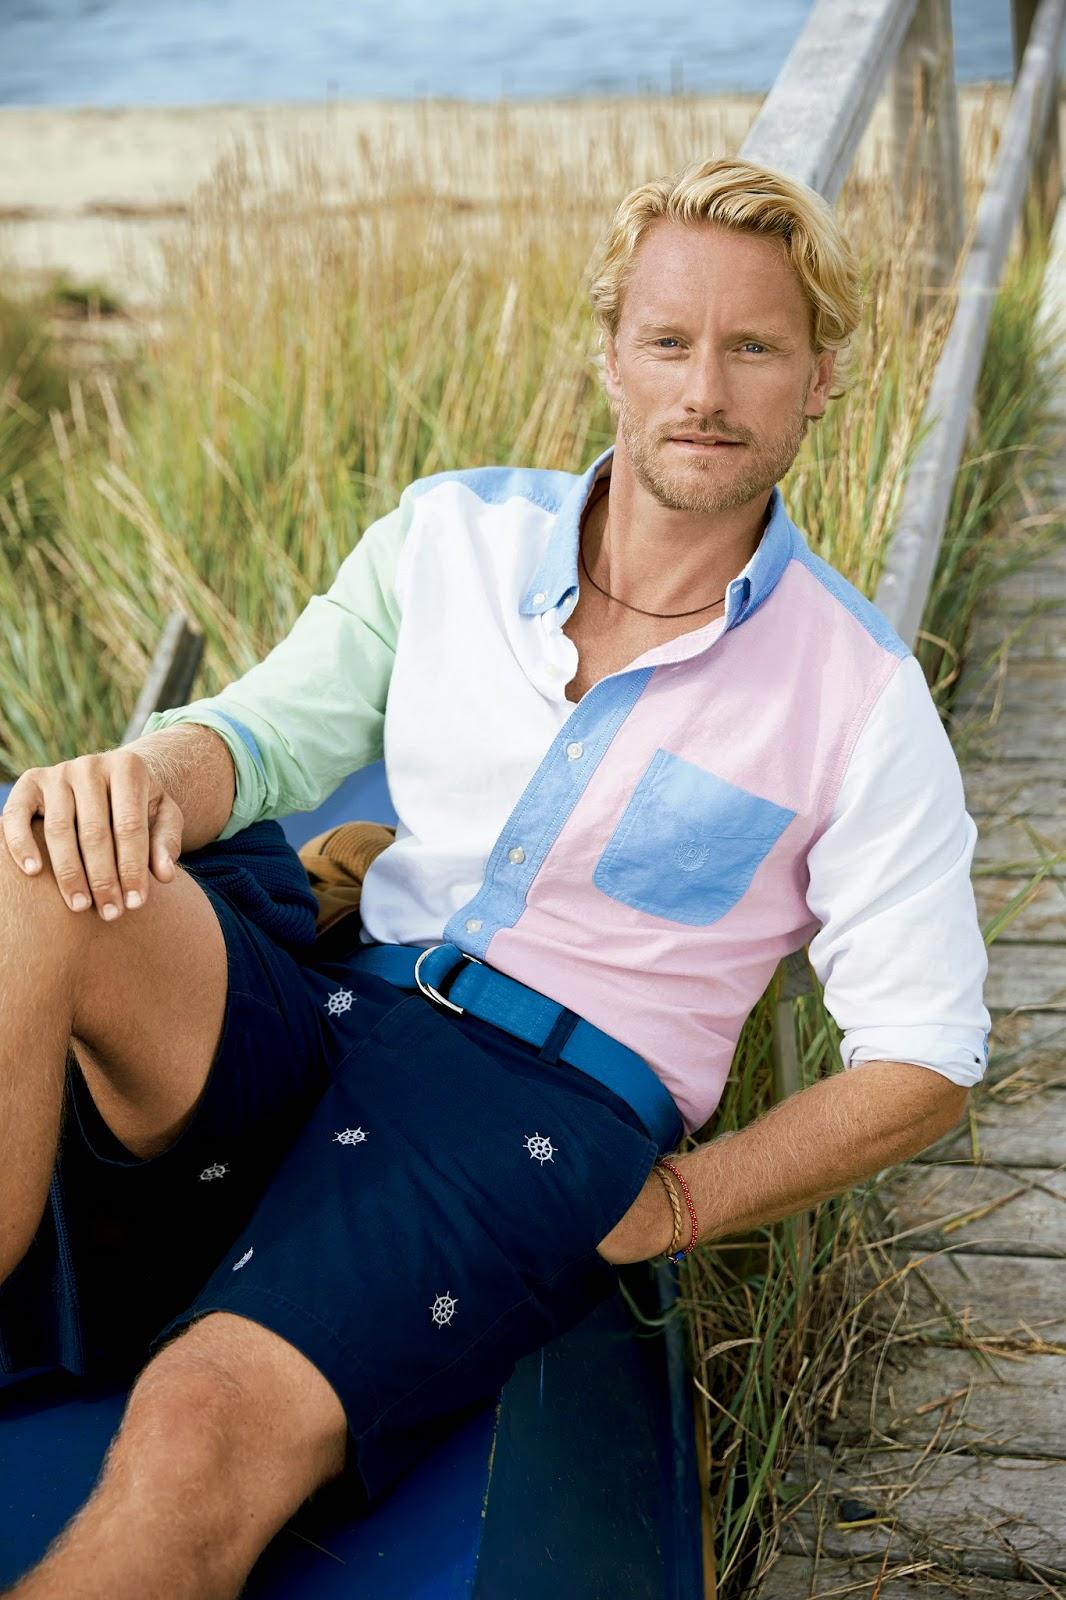 Chaps, moda hombre, moda masculina, menswear, Suits and Shirts, sportwear, sportstyle,